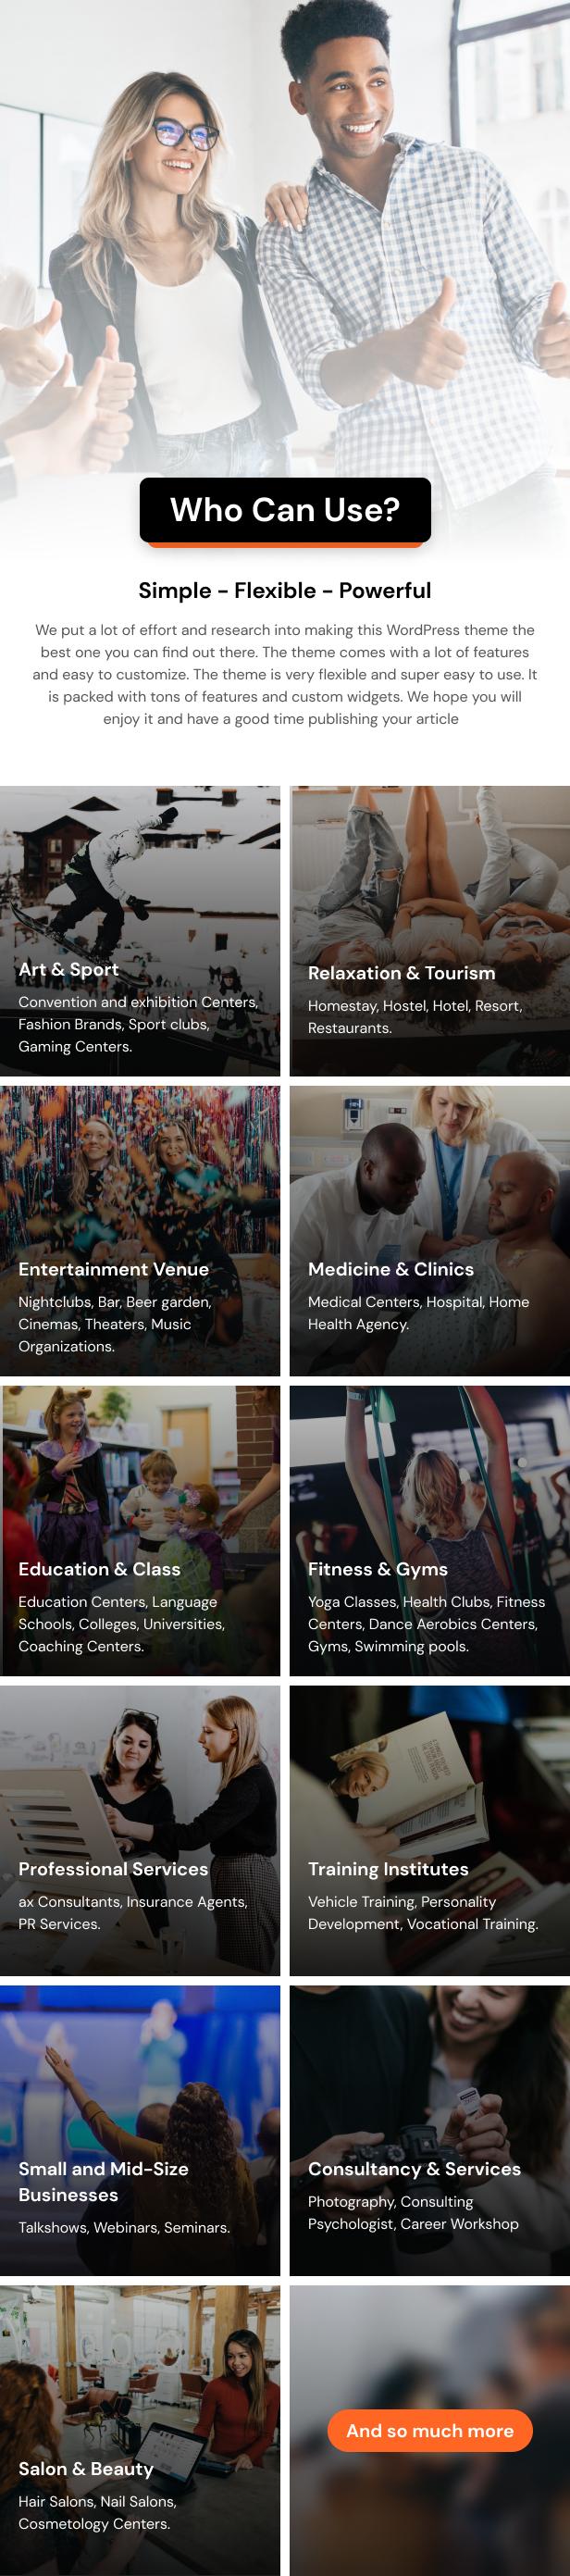 Blognew – Event Management WordPress Blog Theme - 6